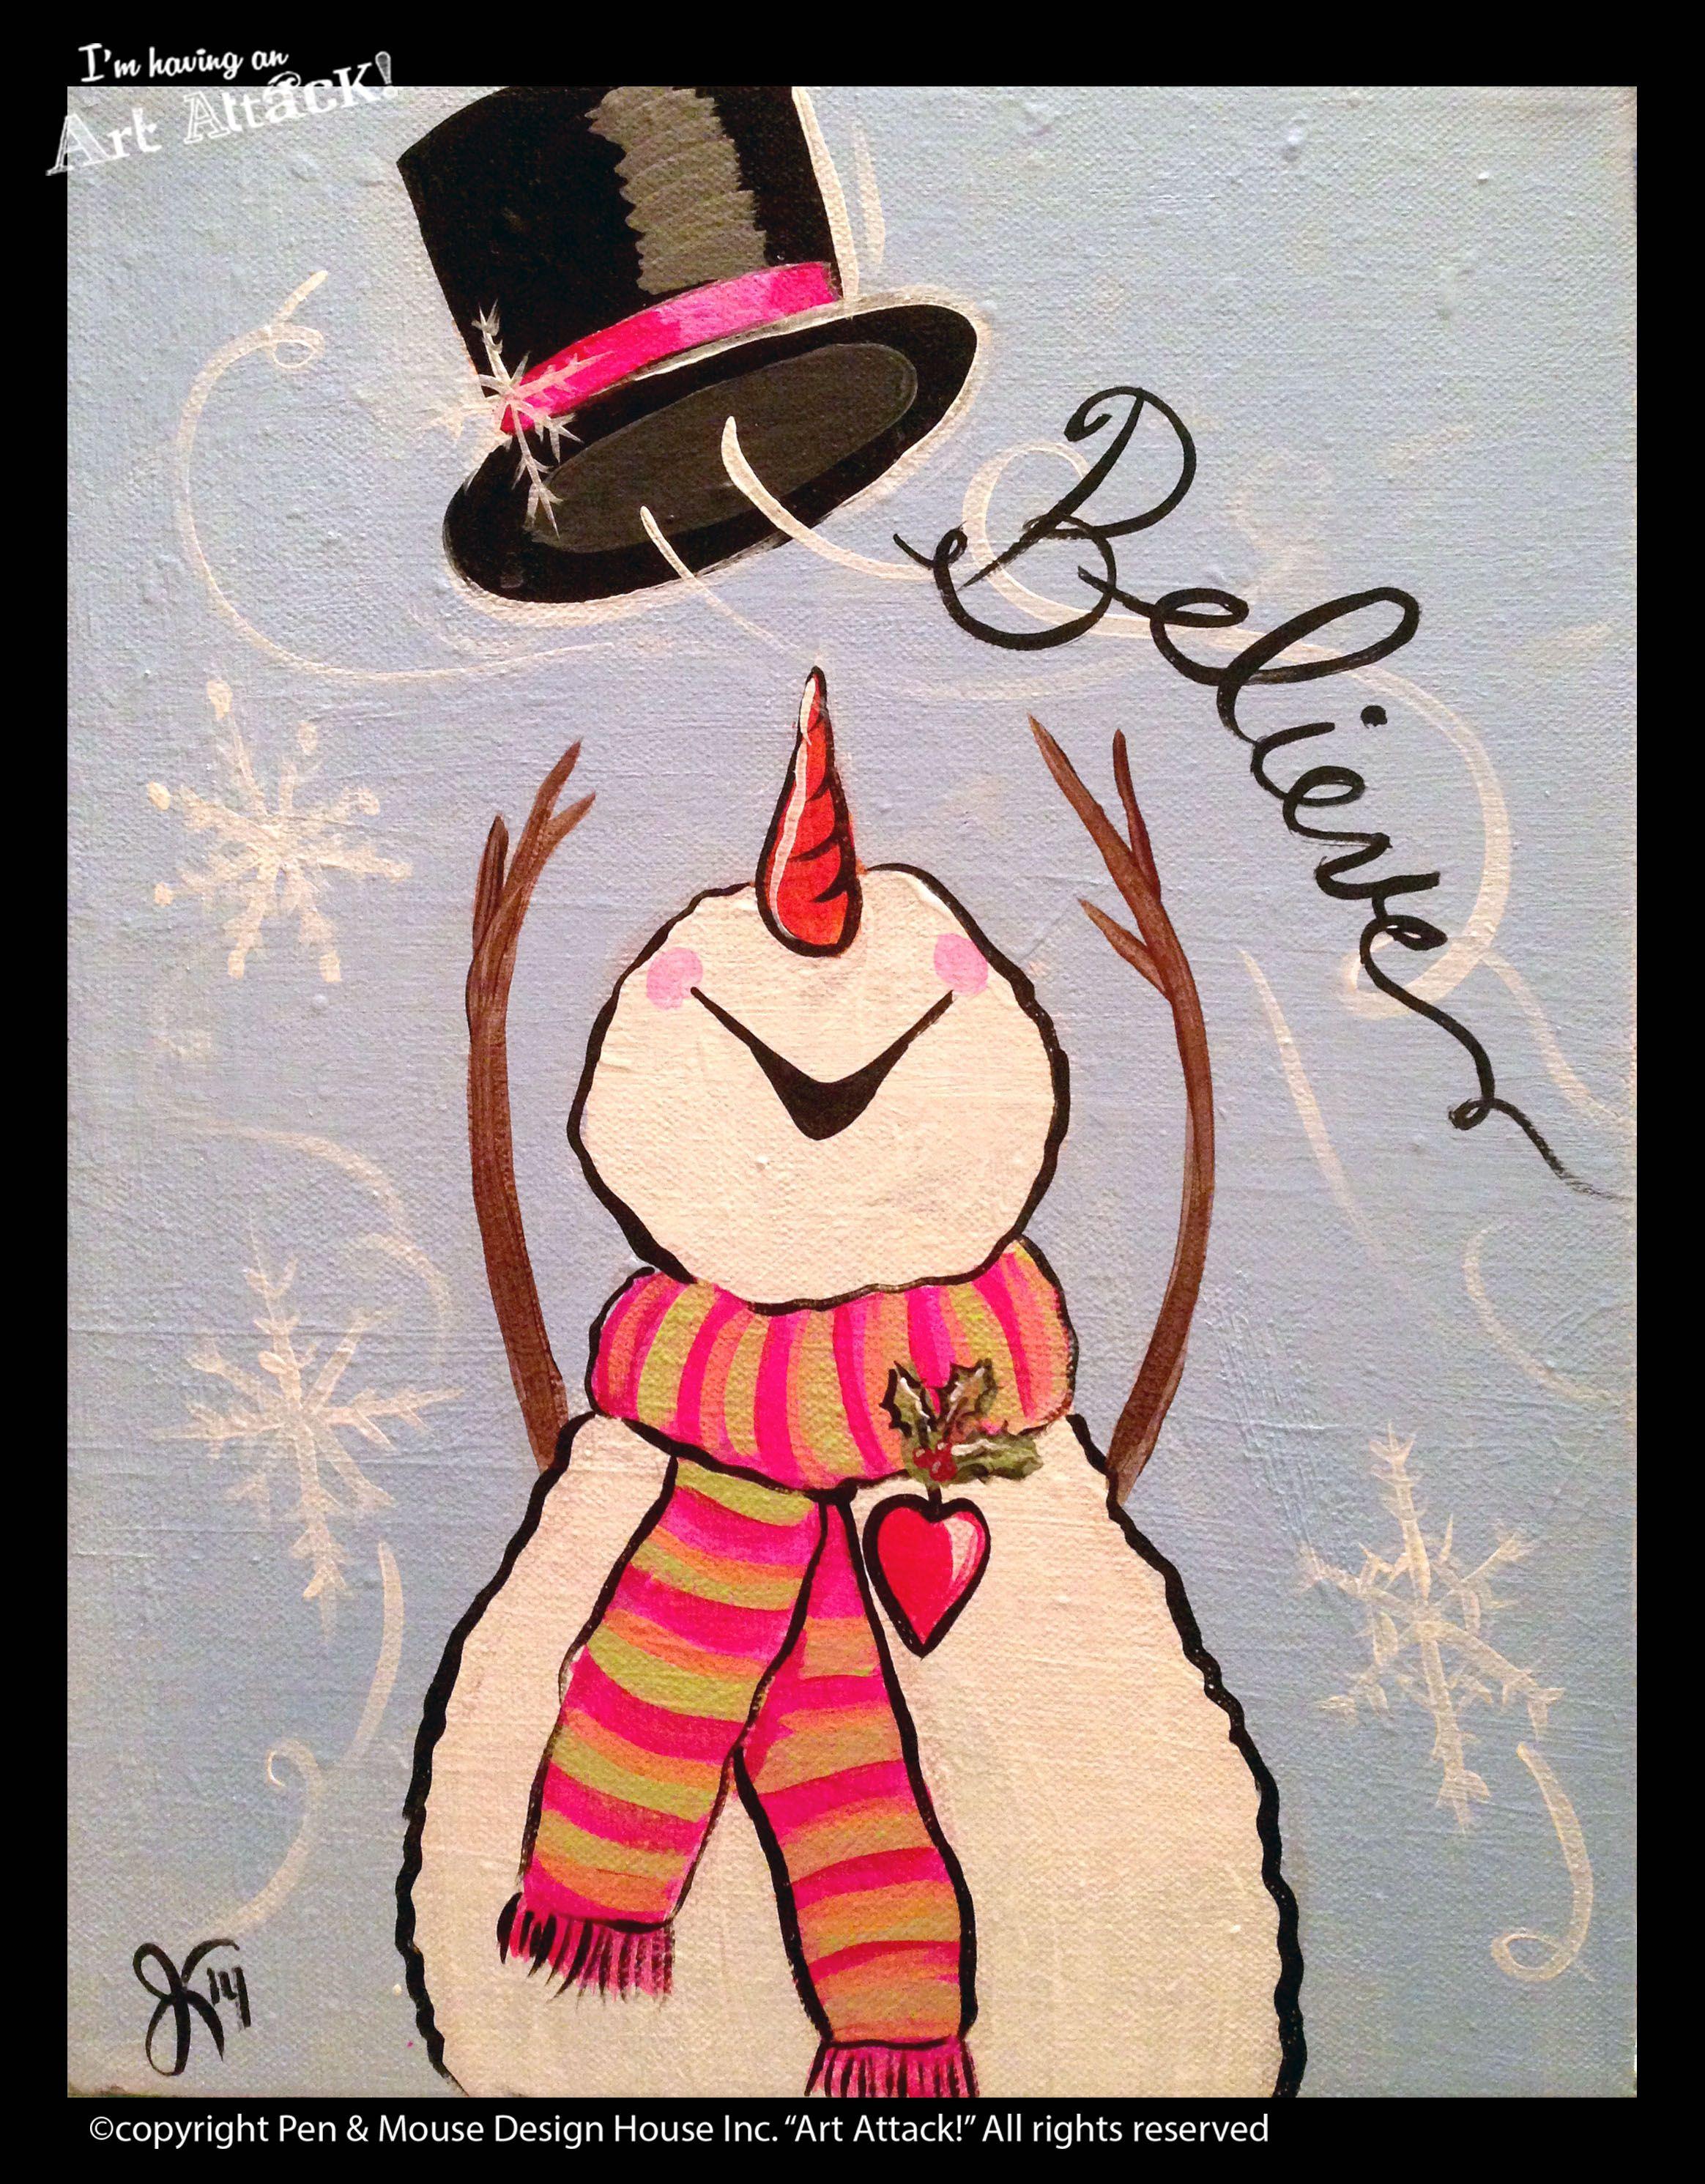 Snowman Believe Canvas Im Having An Art Attack Social Painting Parties Original Artwork By Julie Kukreja Www Artattackpaintparty Com